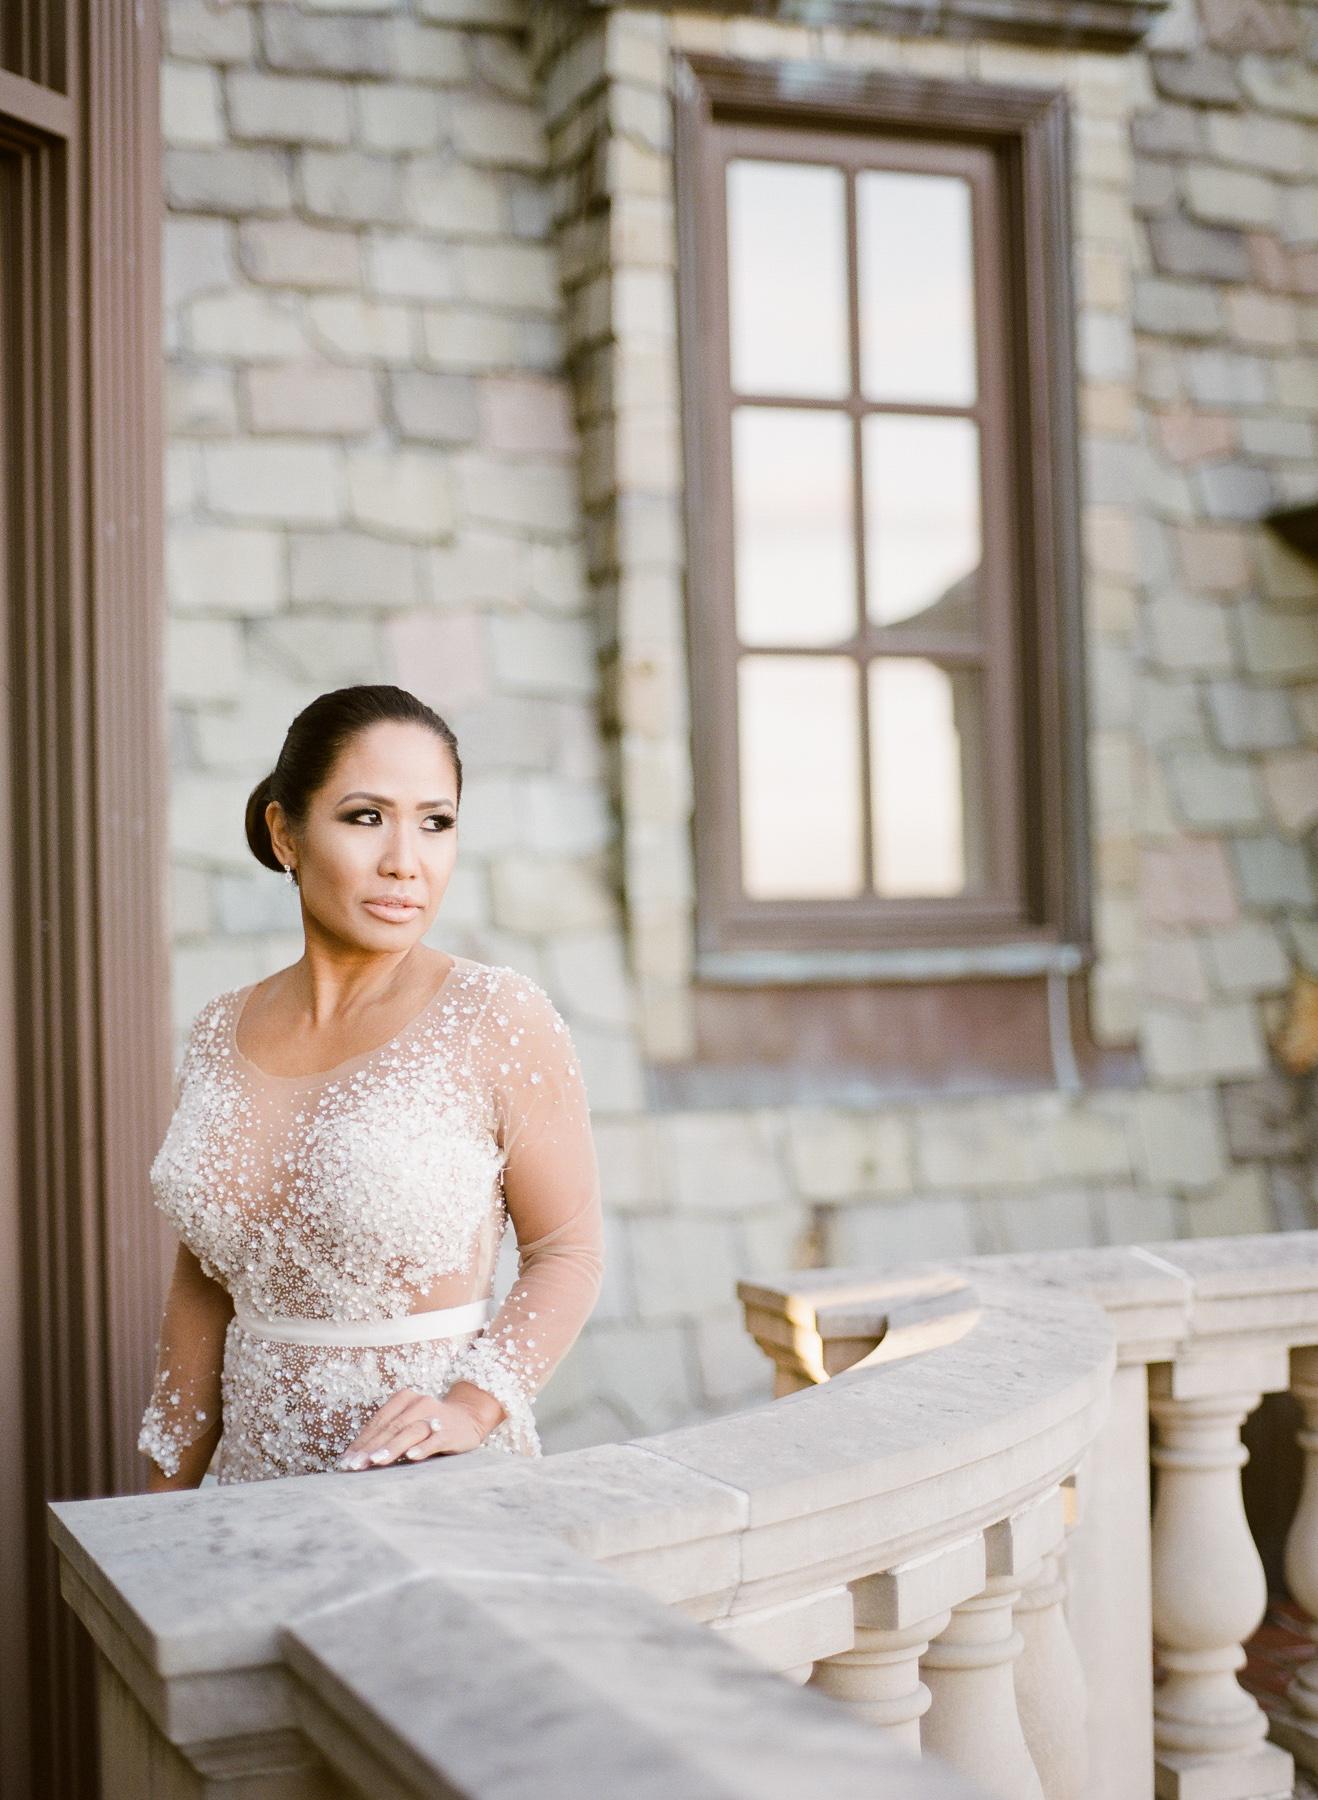 Brian-McKnight-wedding-oheka-castle-039.jpg